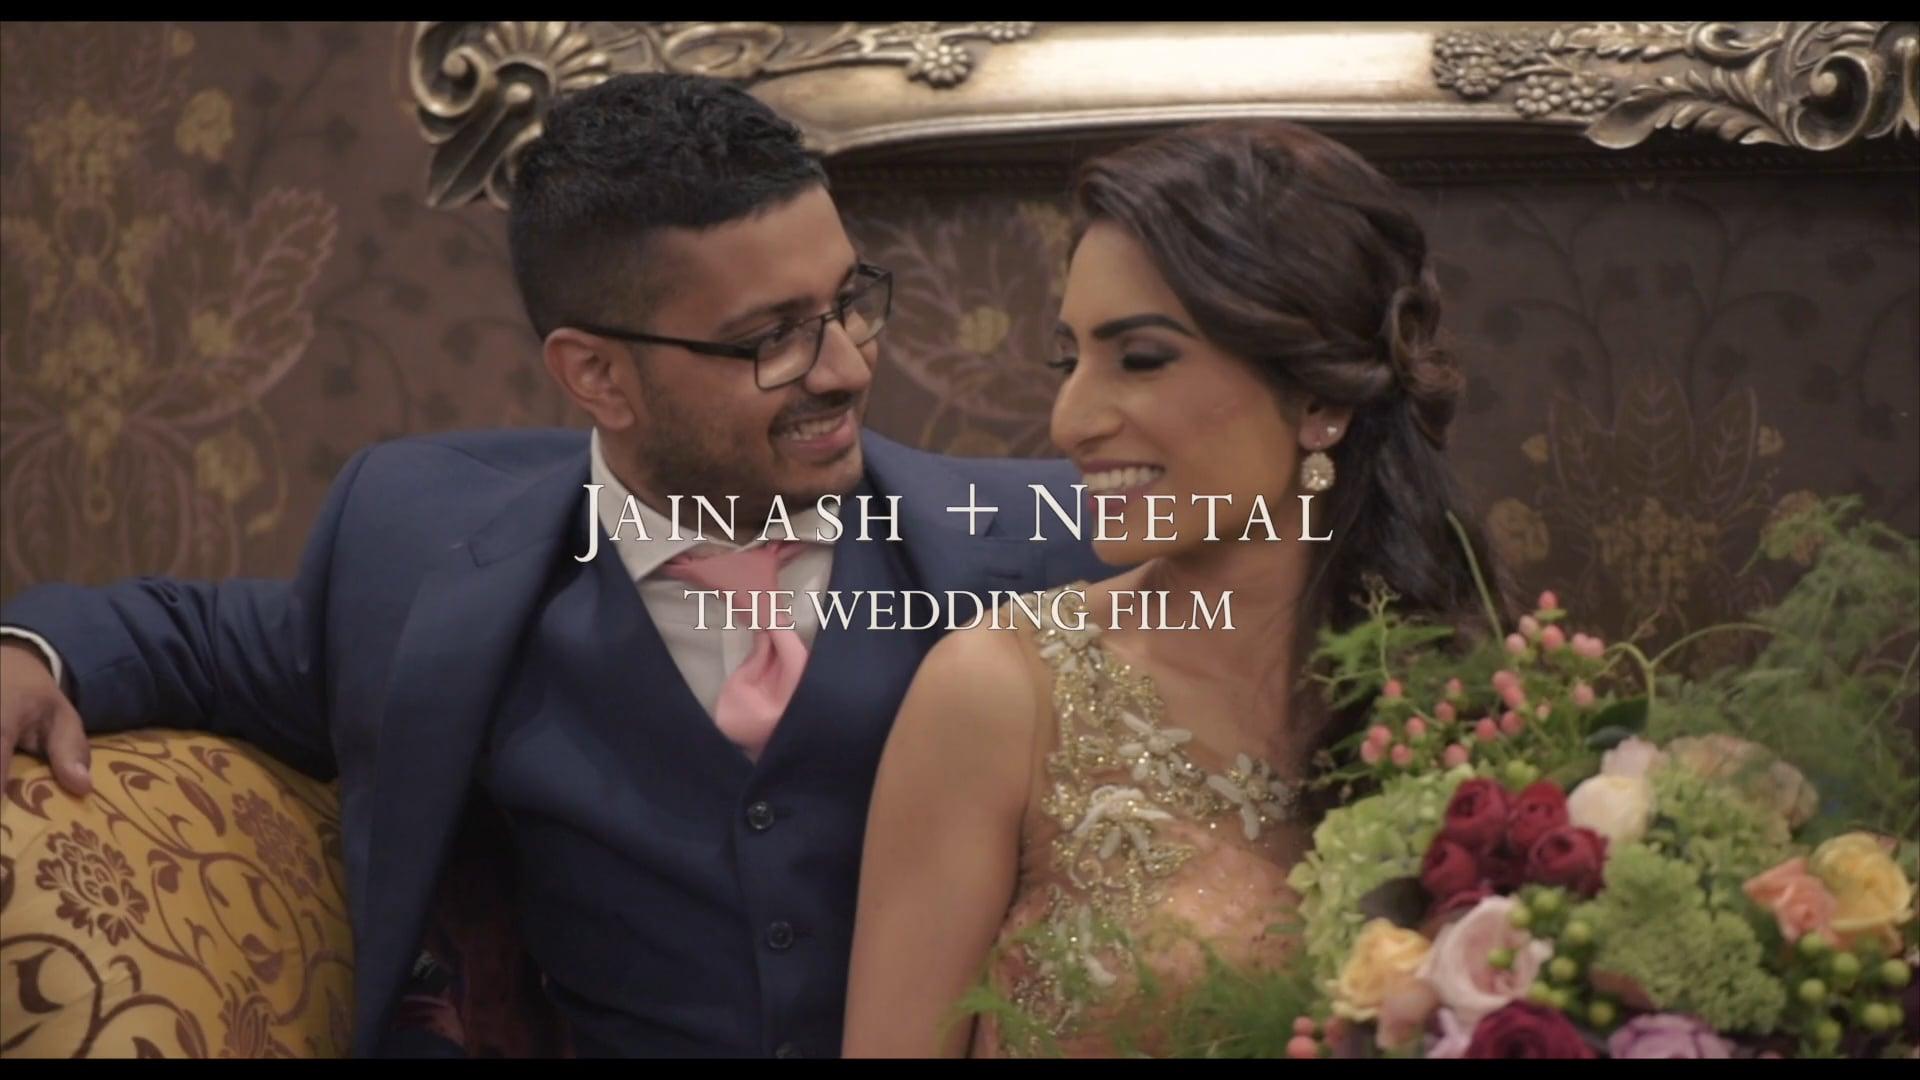 Jainash + Neetal - The Wedding Film // Sansa x Ferndara